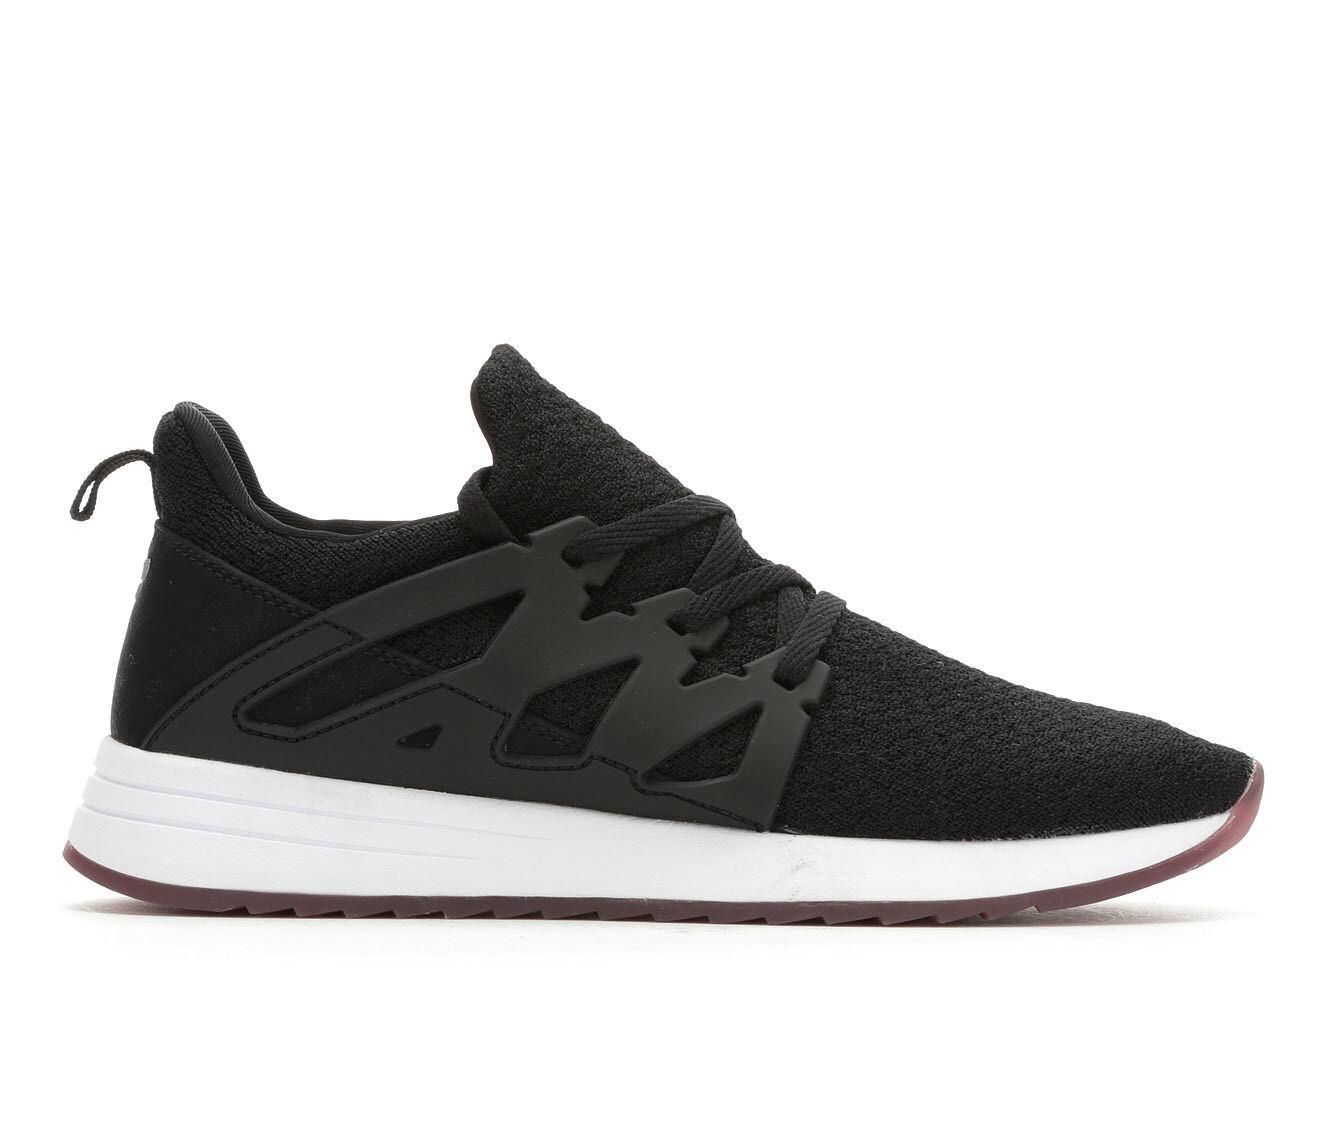 choose authentic new Women's Fabletics Laguna Slip-On Sneakers Black/White/Gum